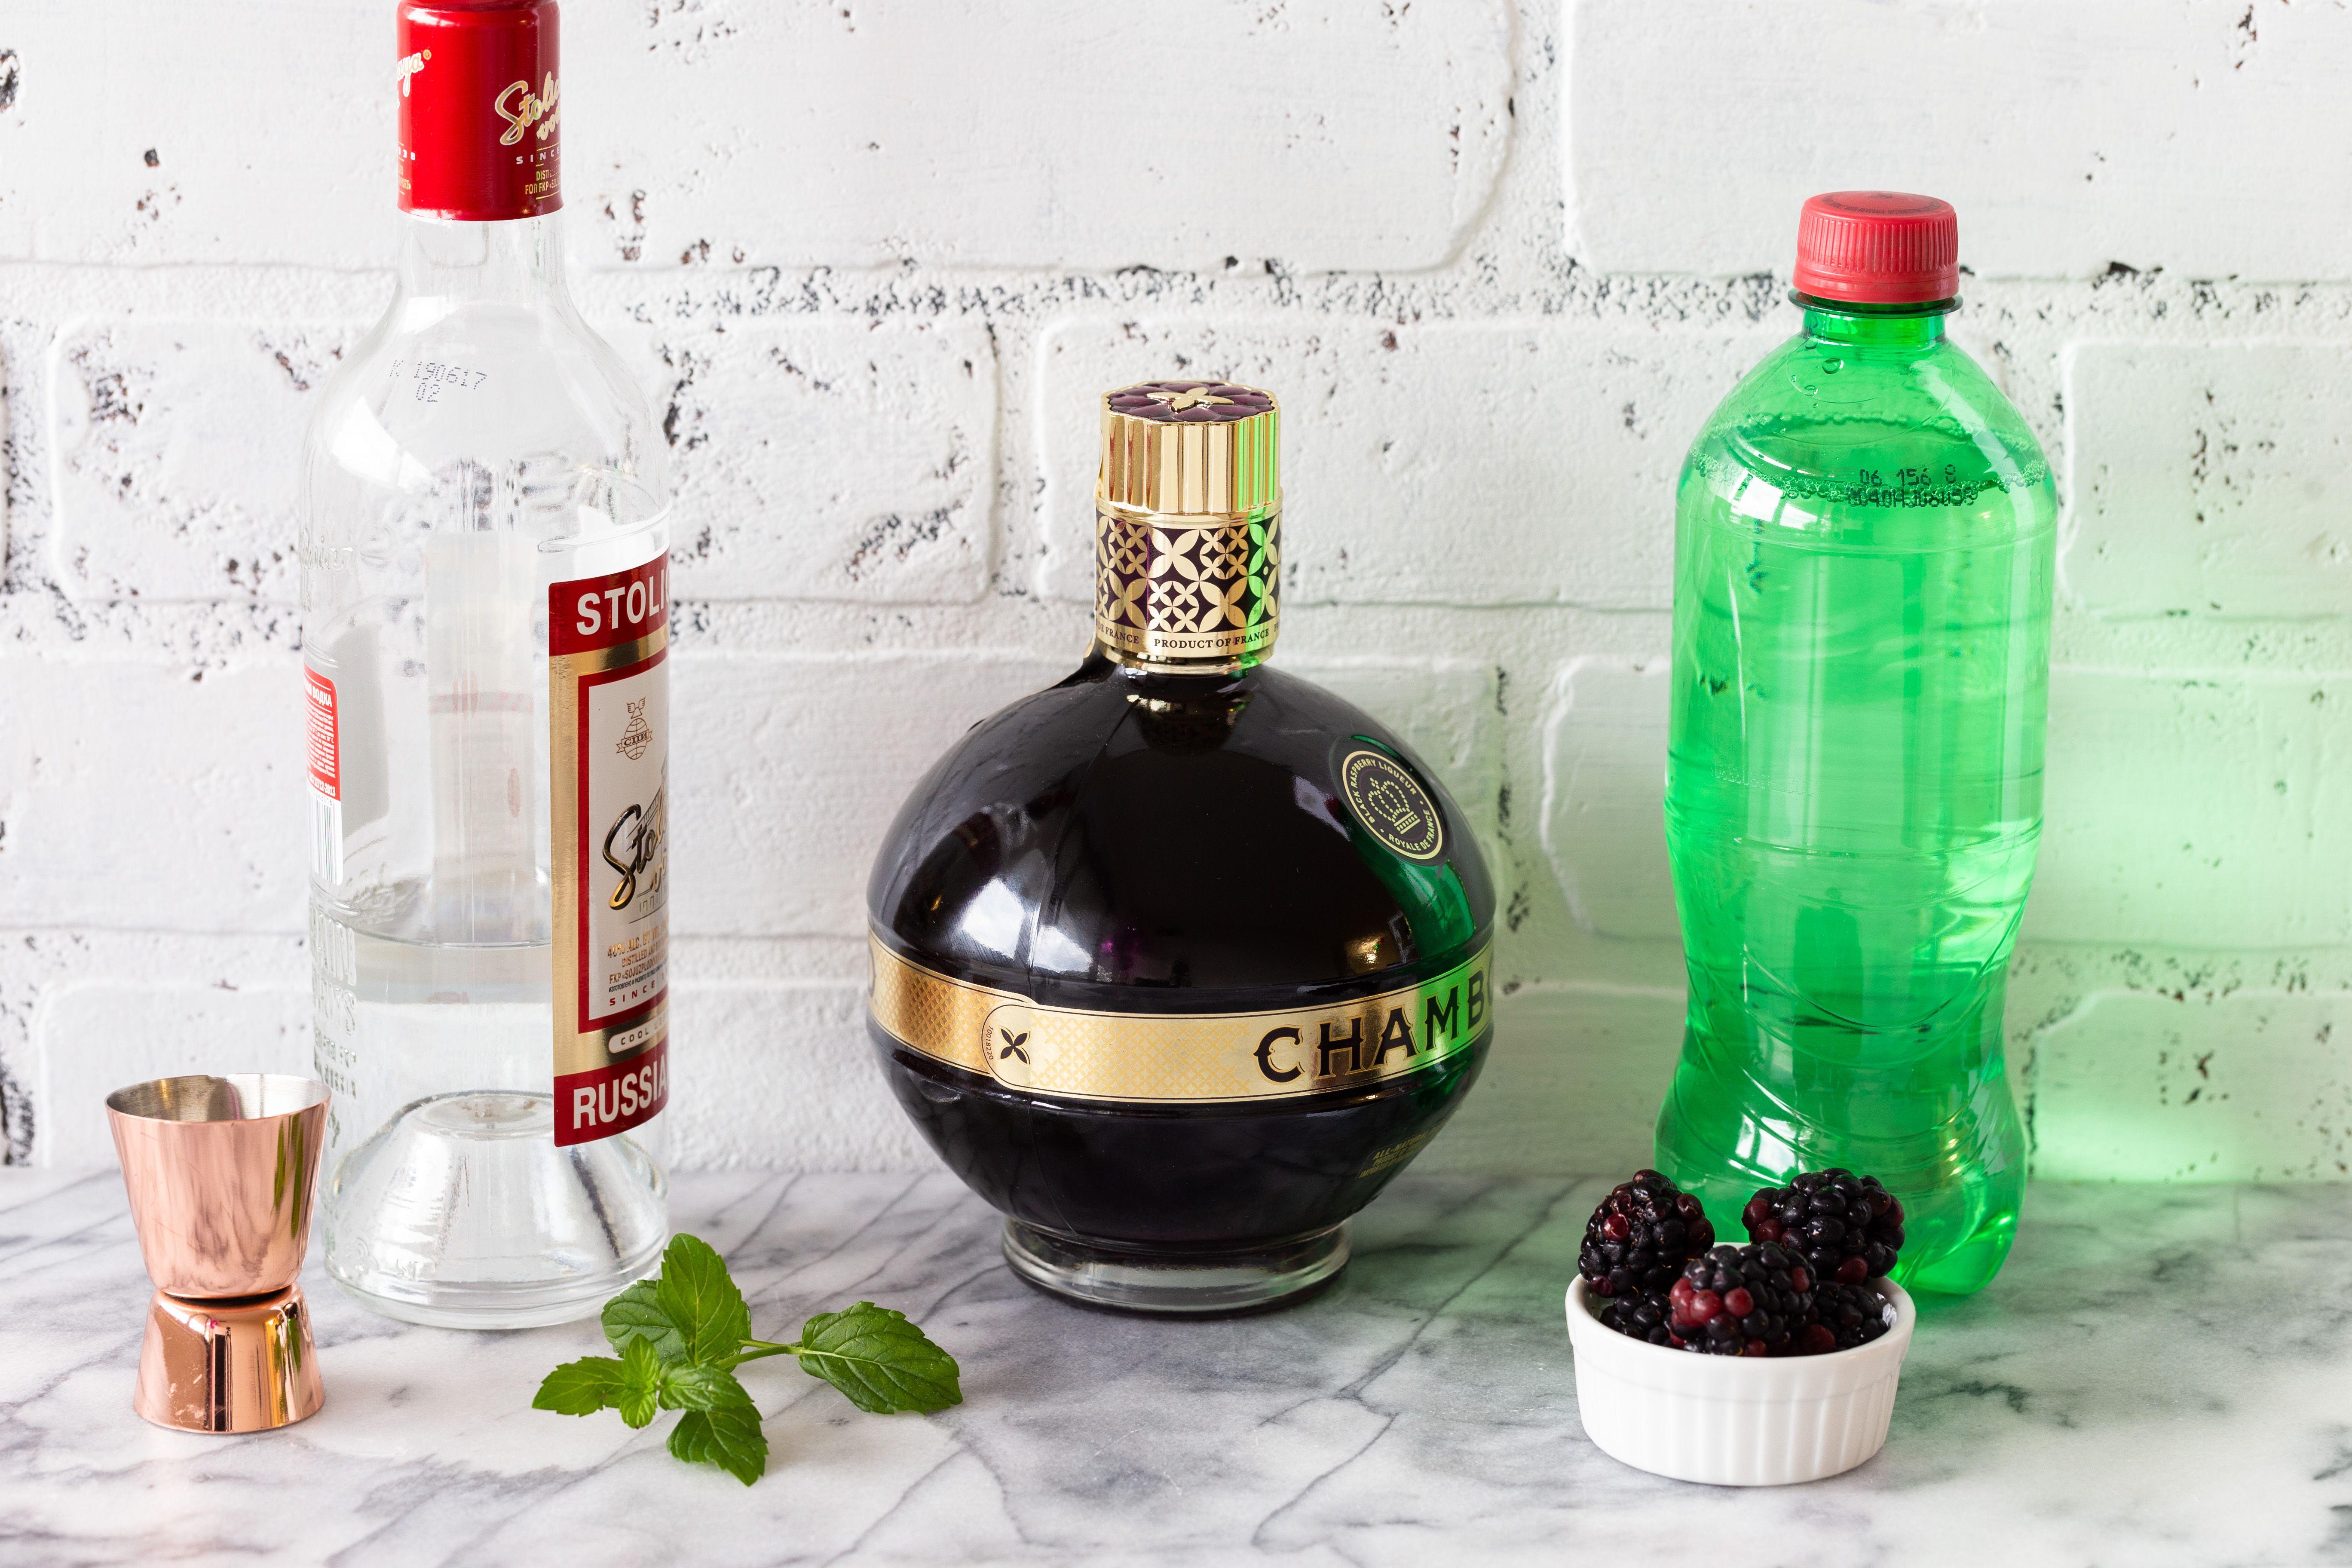 Zipper cocktail ingredients